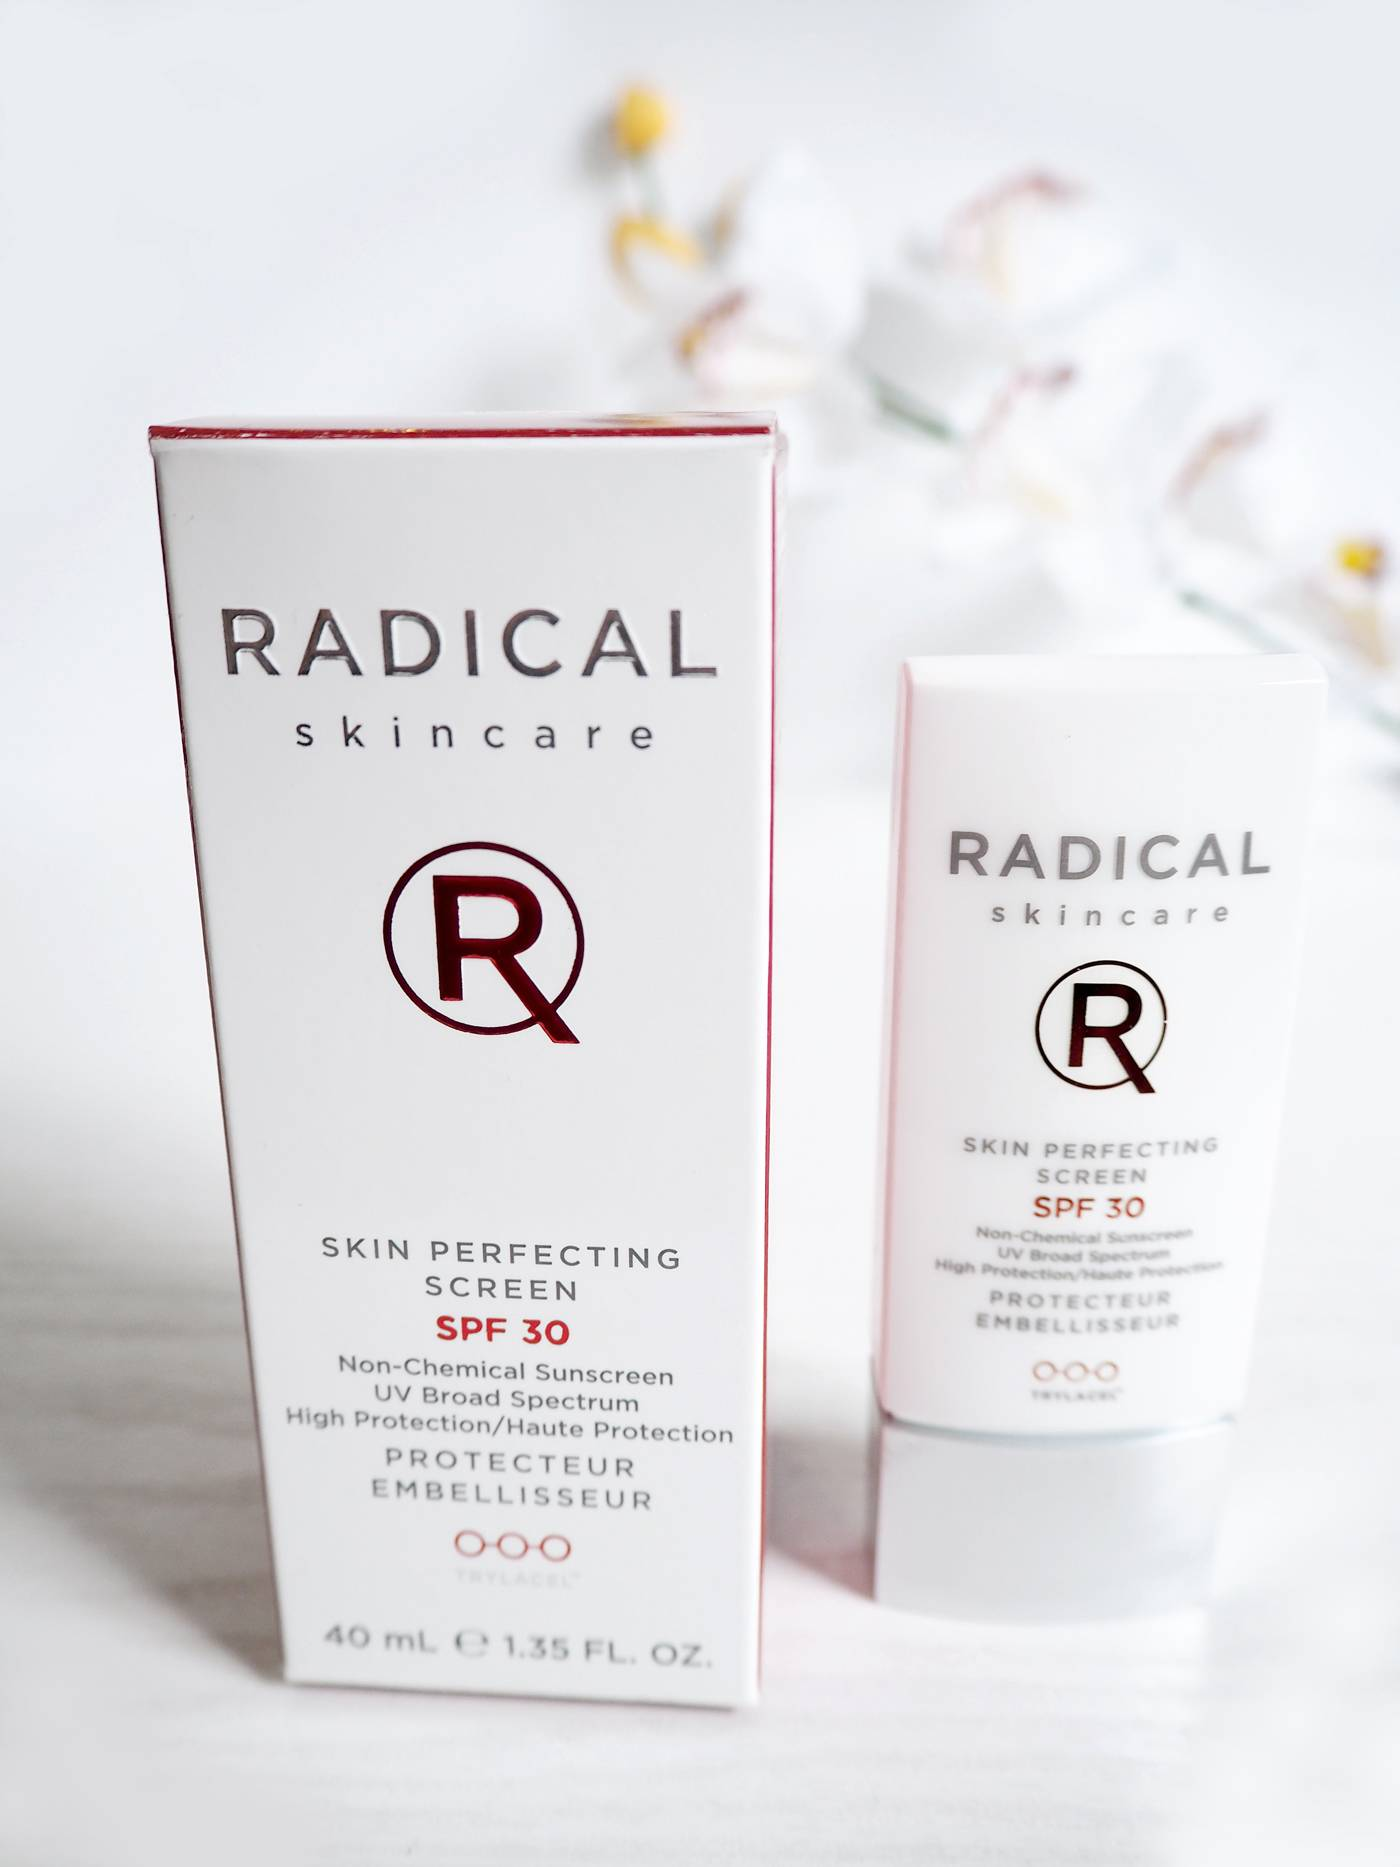 RADICAL-SKINCARE-SKIN-PERFECTING-SPF.2